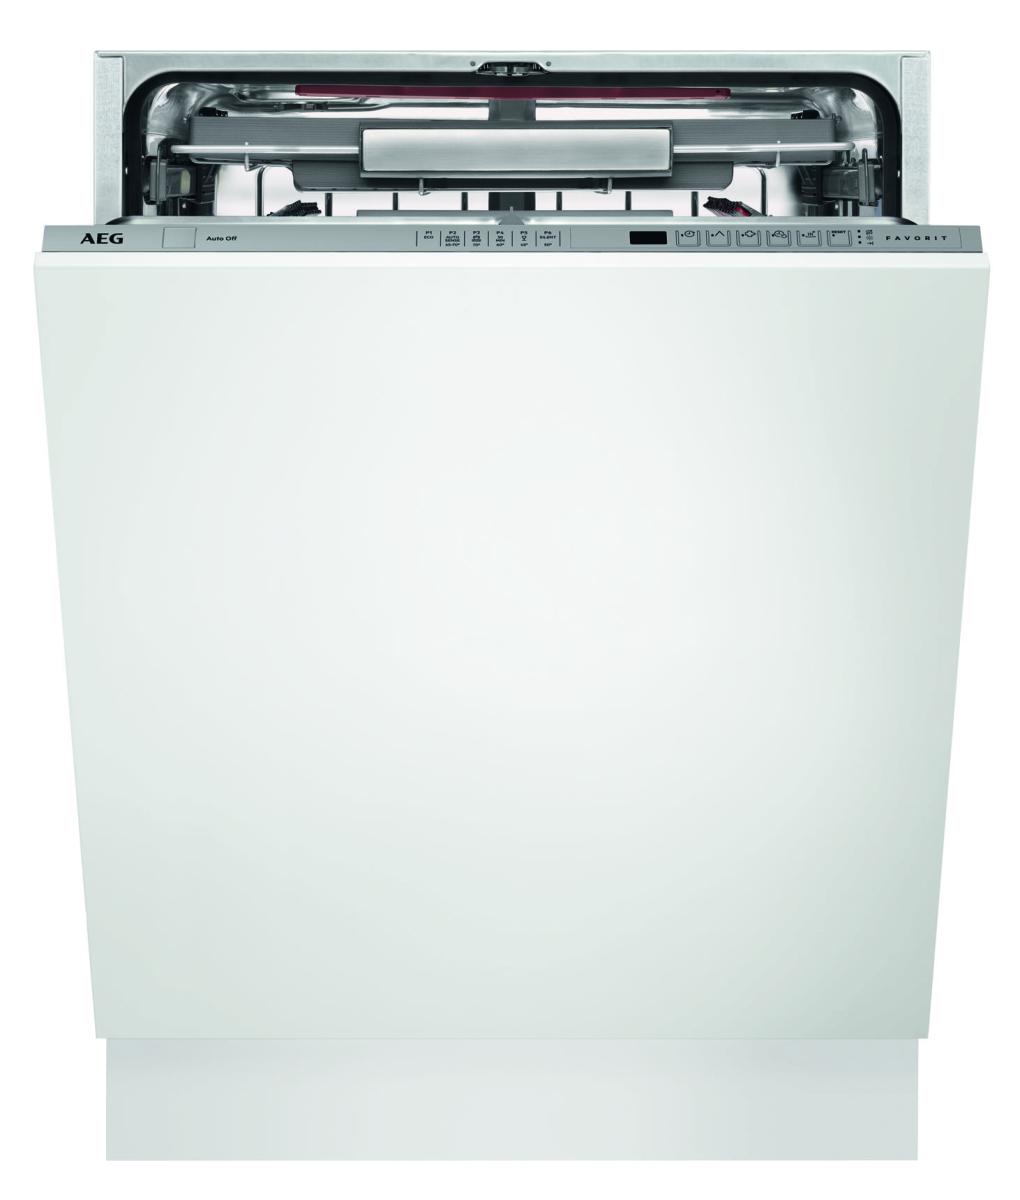 AEG FSE62800P Geschirrspüler 60cm vollintegrierbar 44/42dB ab 7 L ...